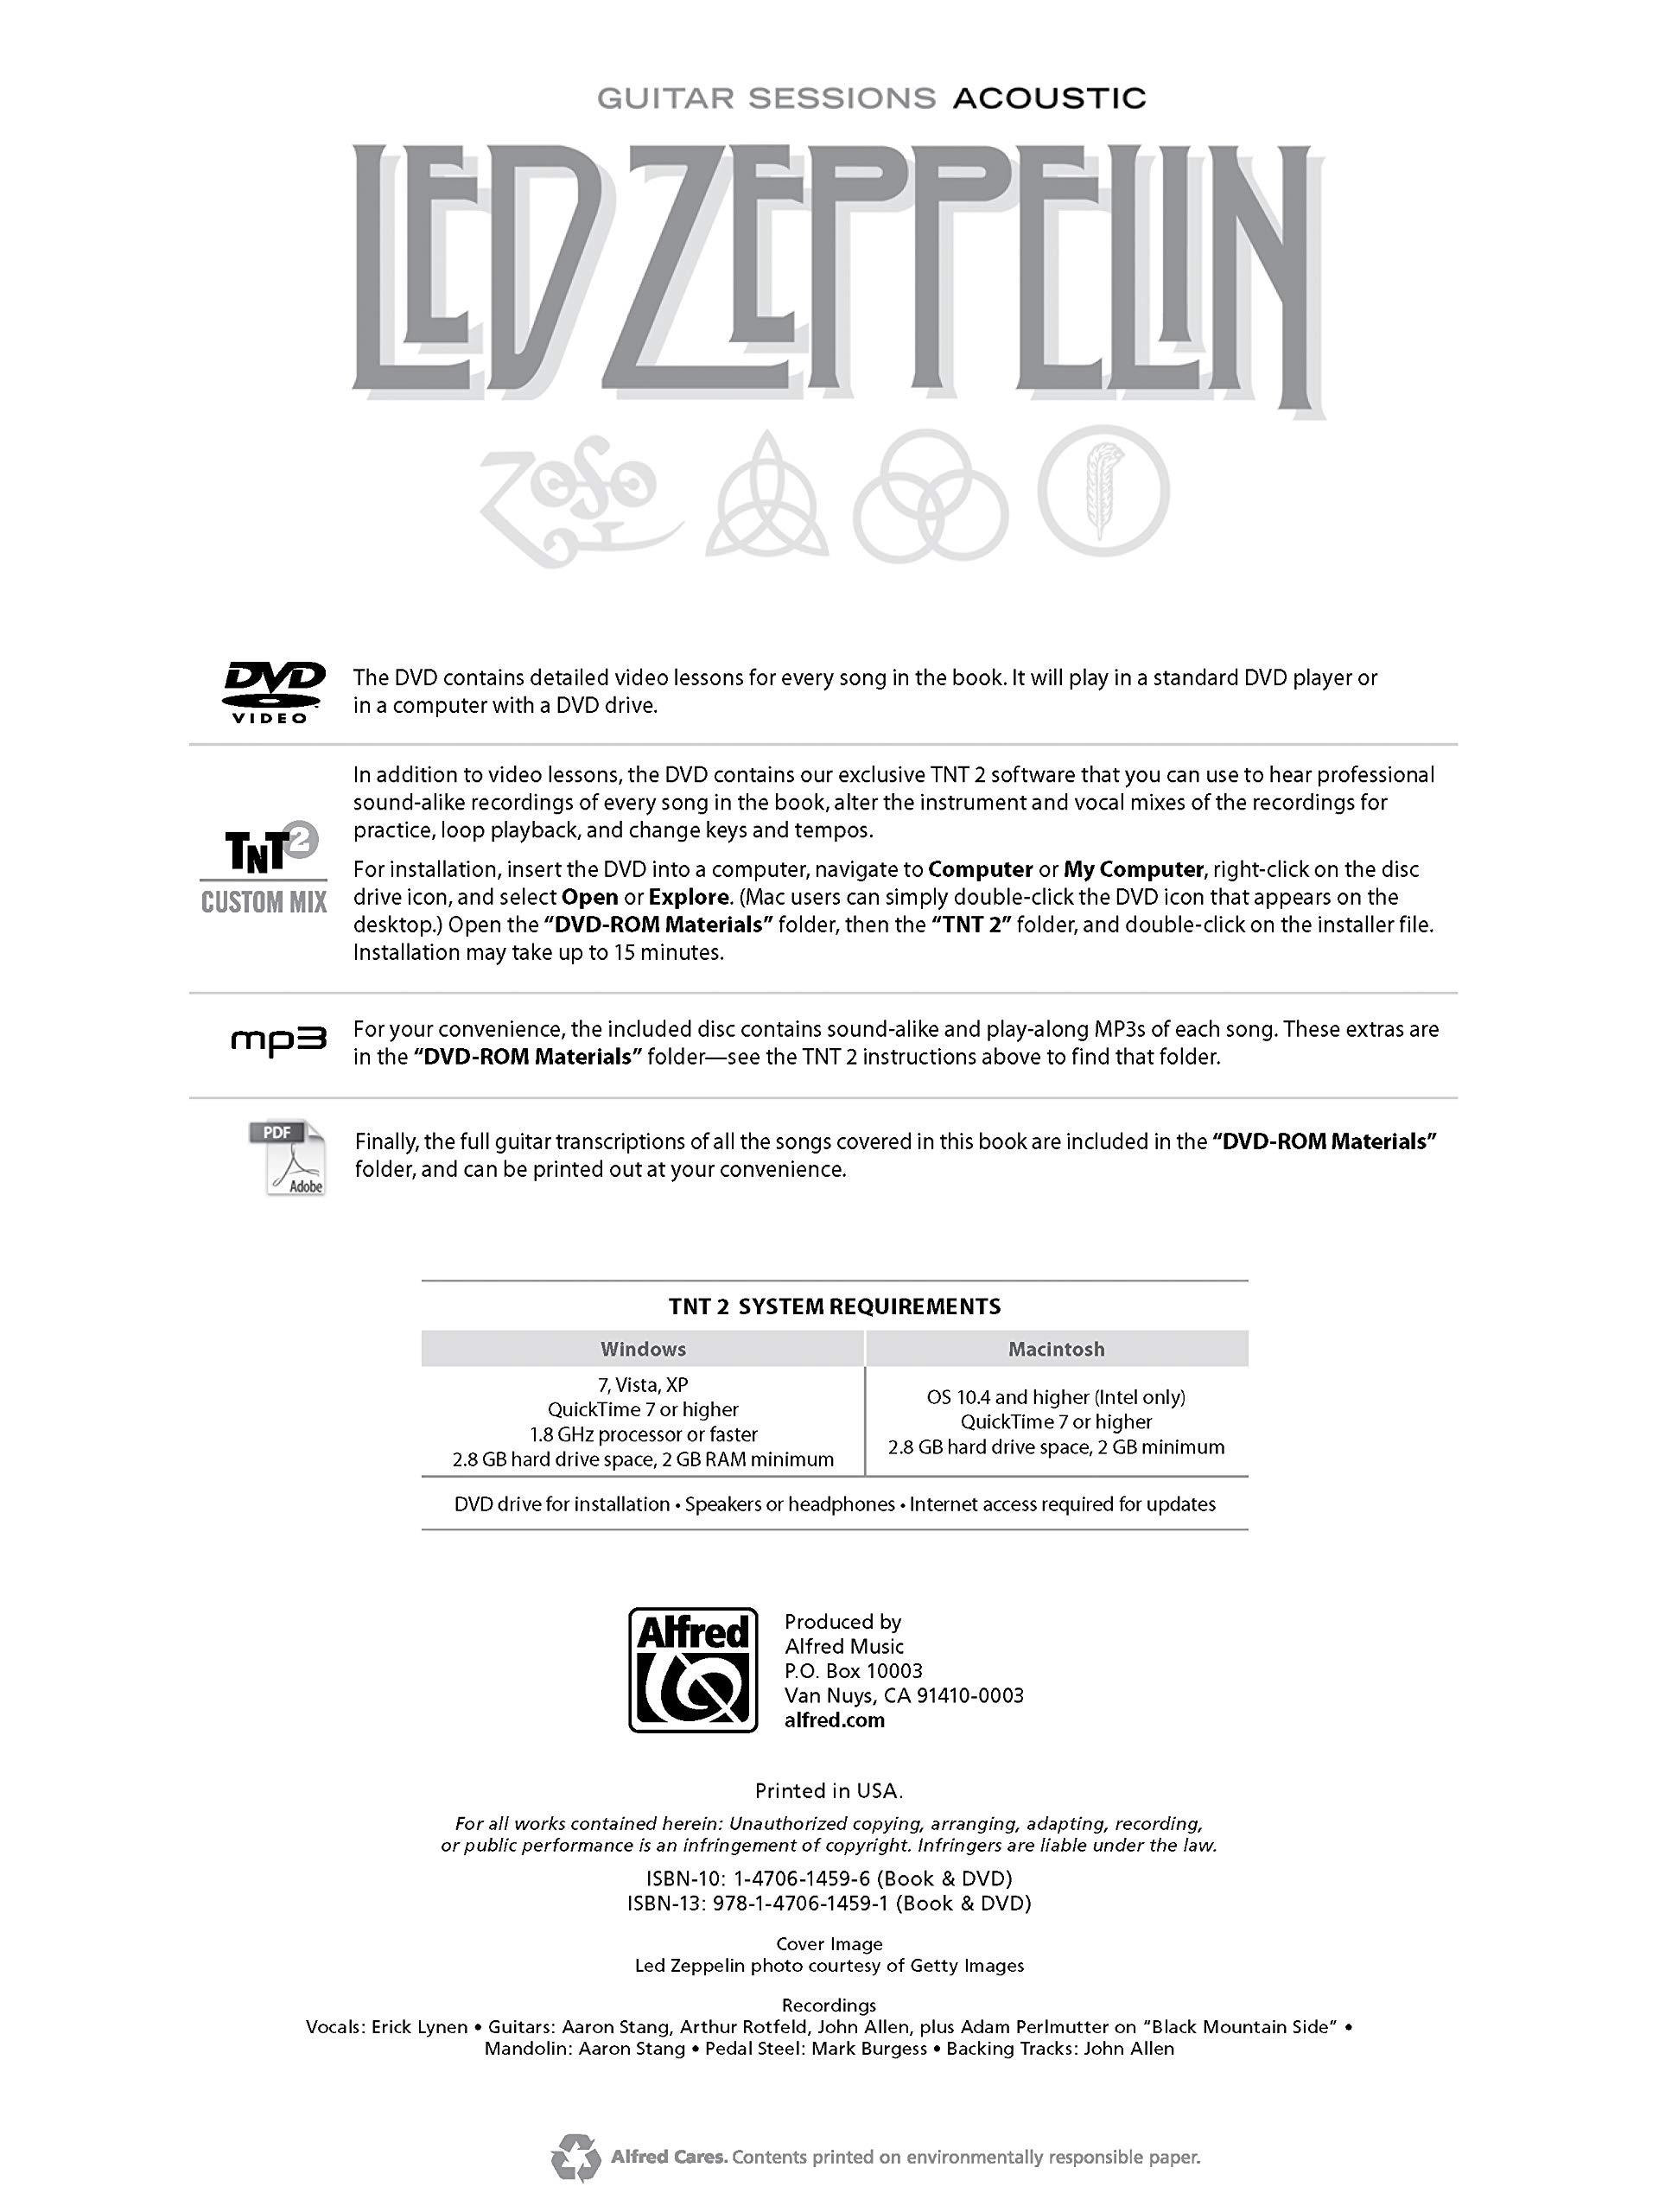 Guitar Sessions -- Led Zeppelin Acoustic: Book & DVD: Amazon.es ...